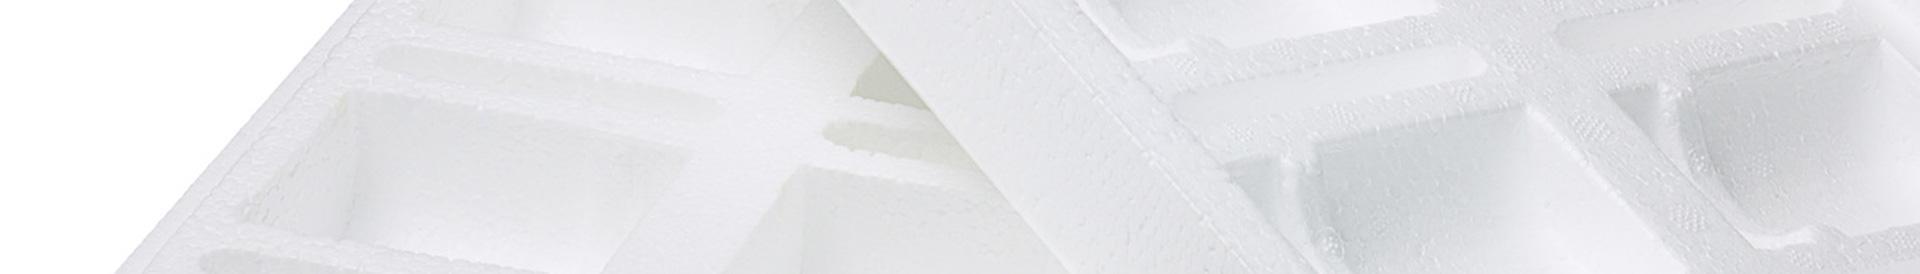 Wyroby styropianowe banner - styromat